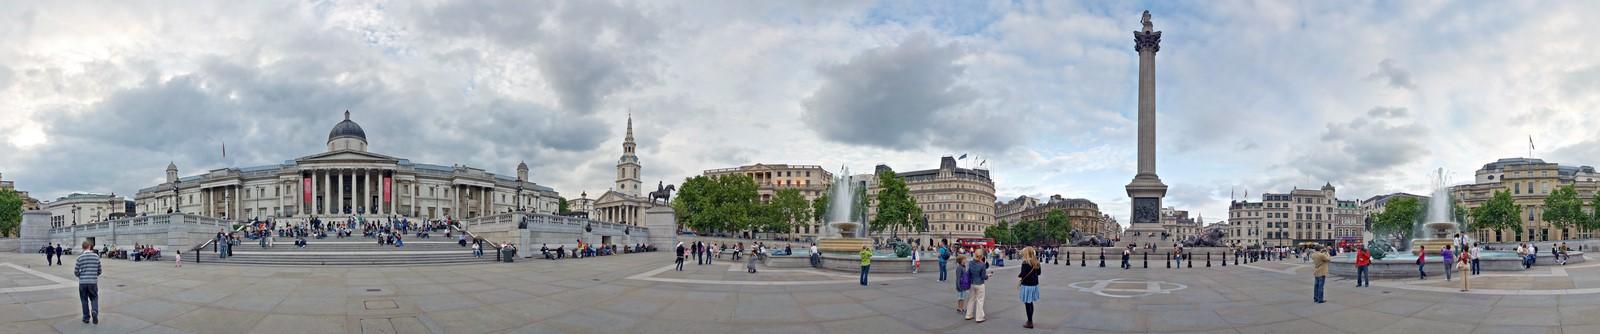 Trafalgar Square - Sheet1